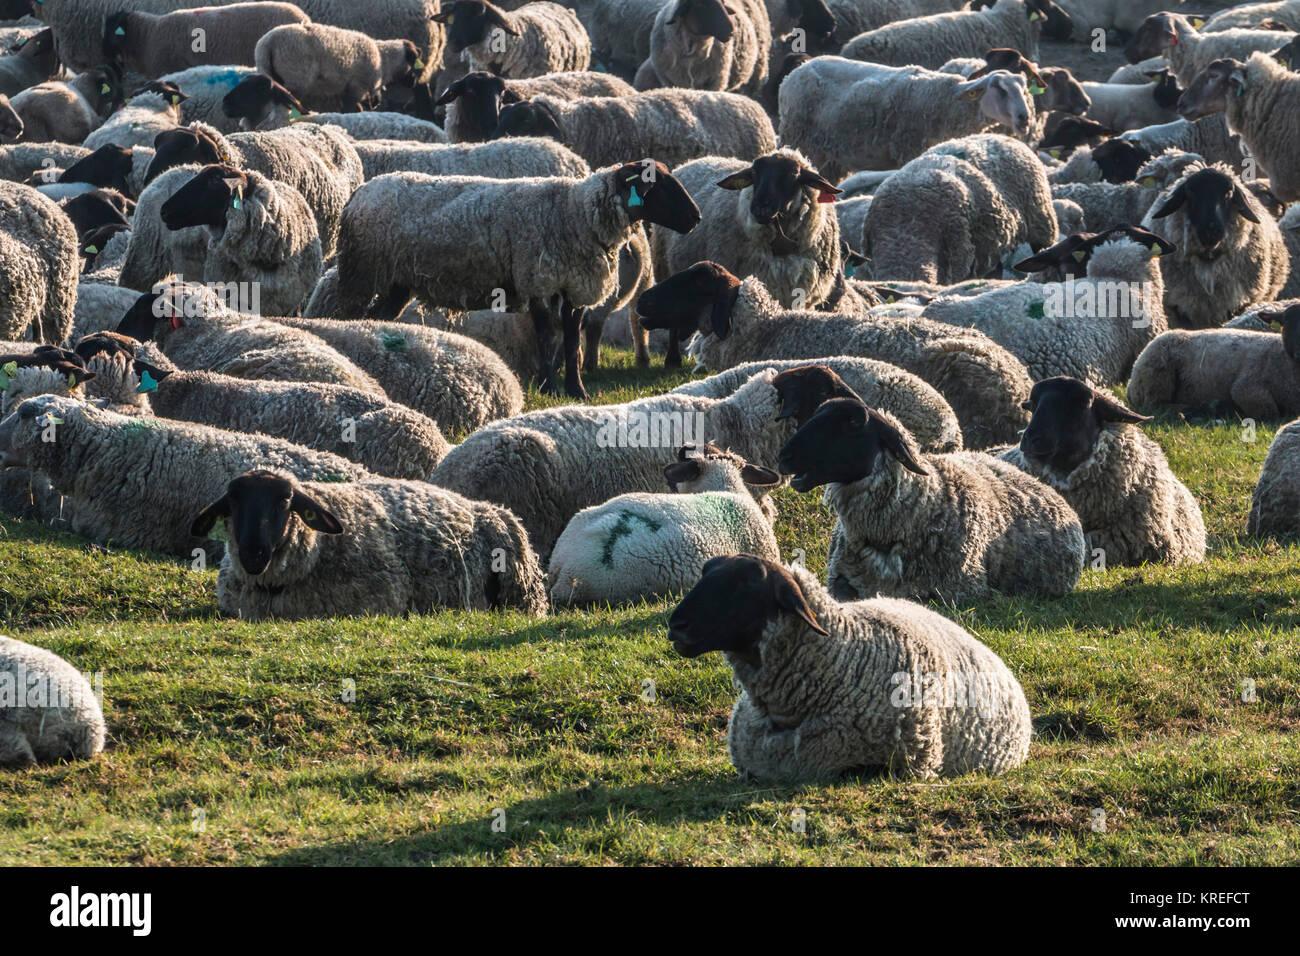 Mont Saint-Michel (Saint Michael's Mount), Normandy, north-western France: Salt meadow sheep in salt marshes. - Stock Image